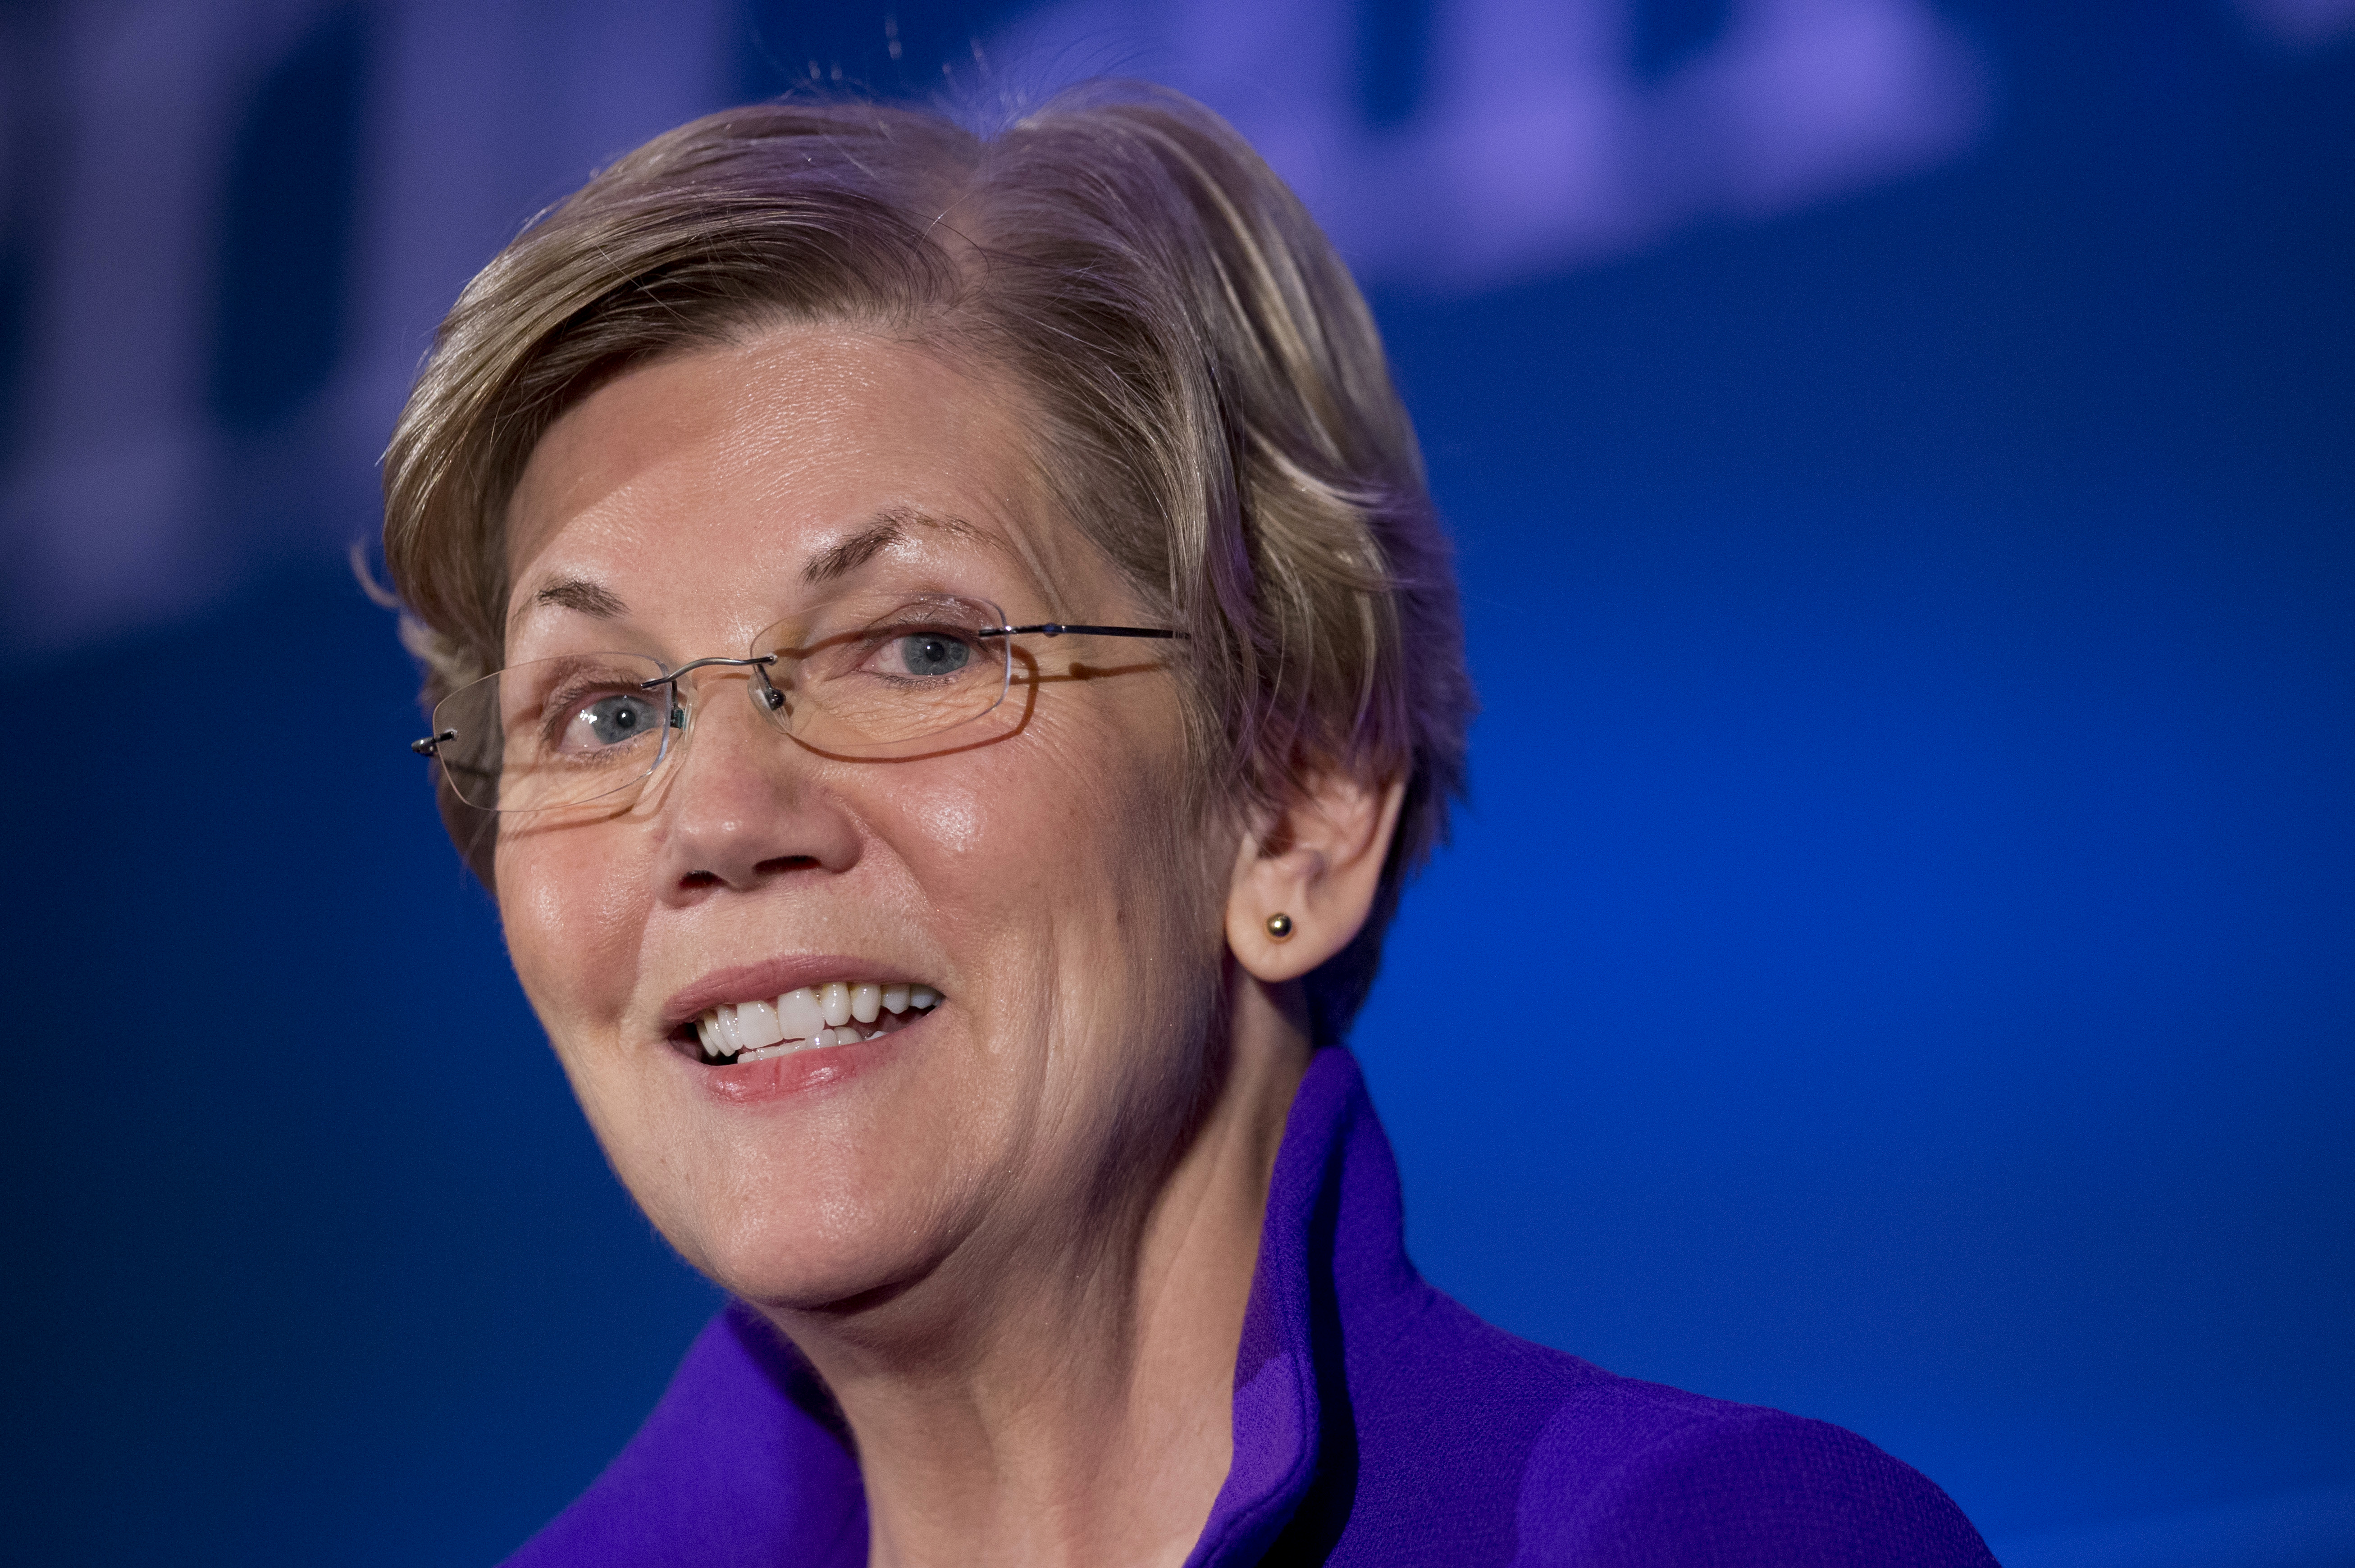 Sen. Elizabeth Warren, D-Mass. speaks to the Center for American Progress�s Second Annual Policy Conference in Washington, Wednesday, Nov. 19, 2014.  (AP Photo/Manuel Balce Ceneta)